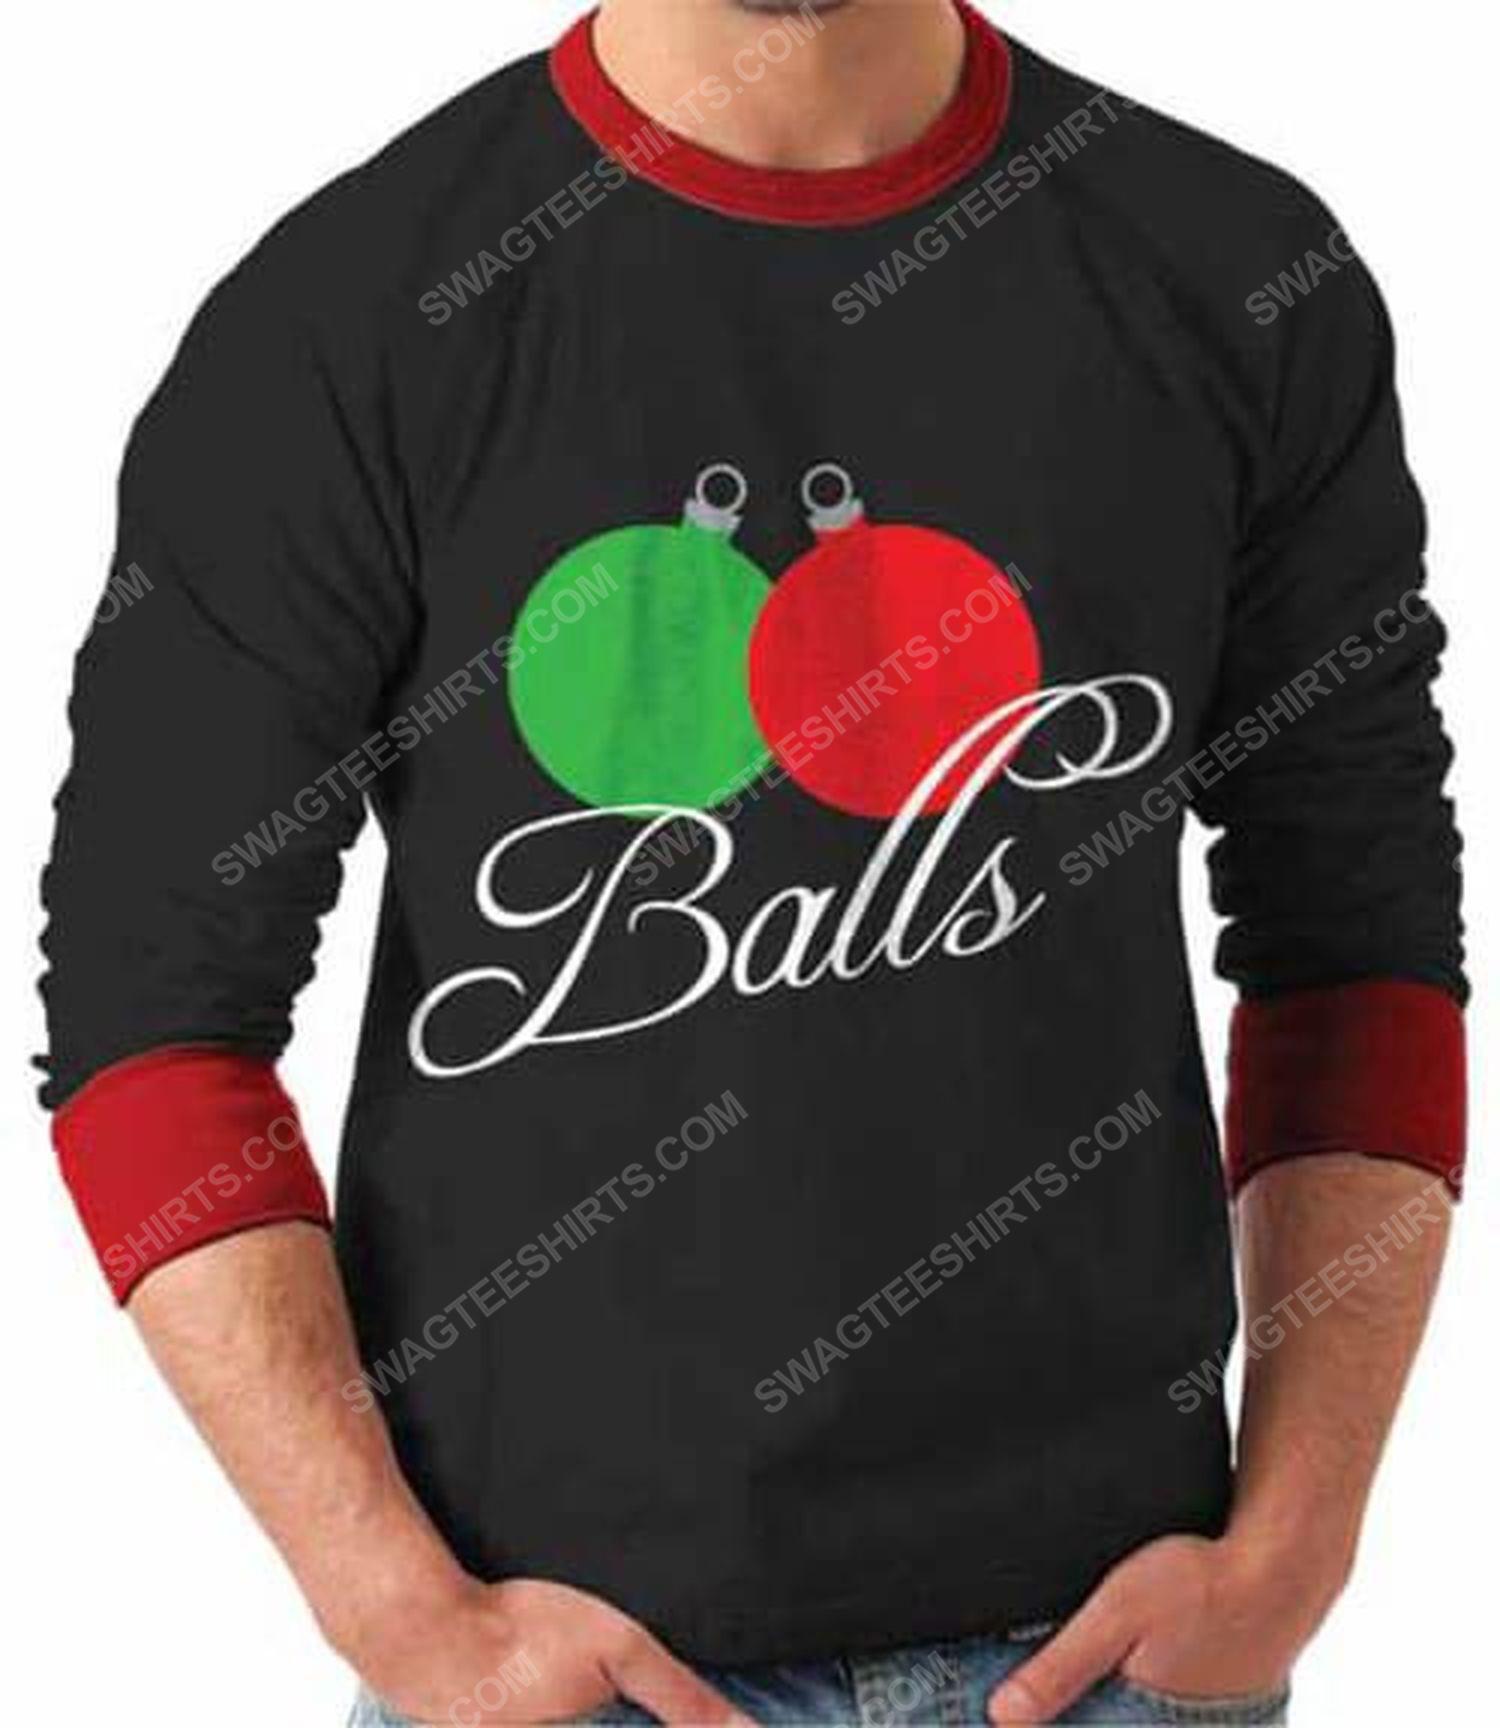 Balls lover full print ugly christmas sweater 2